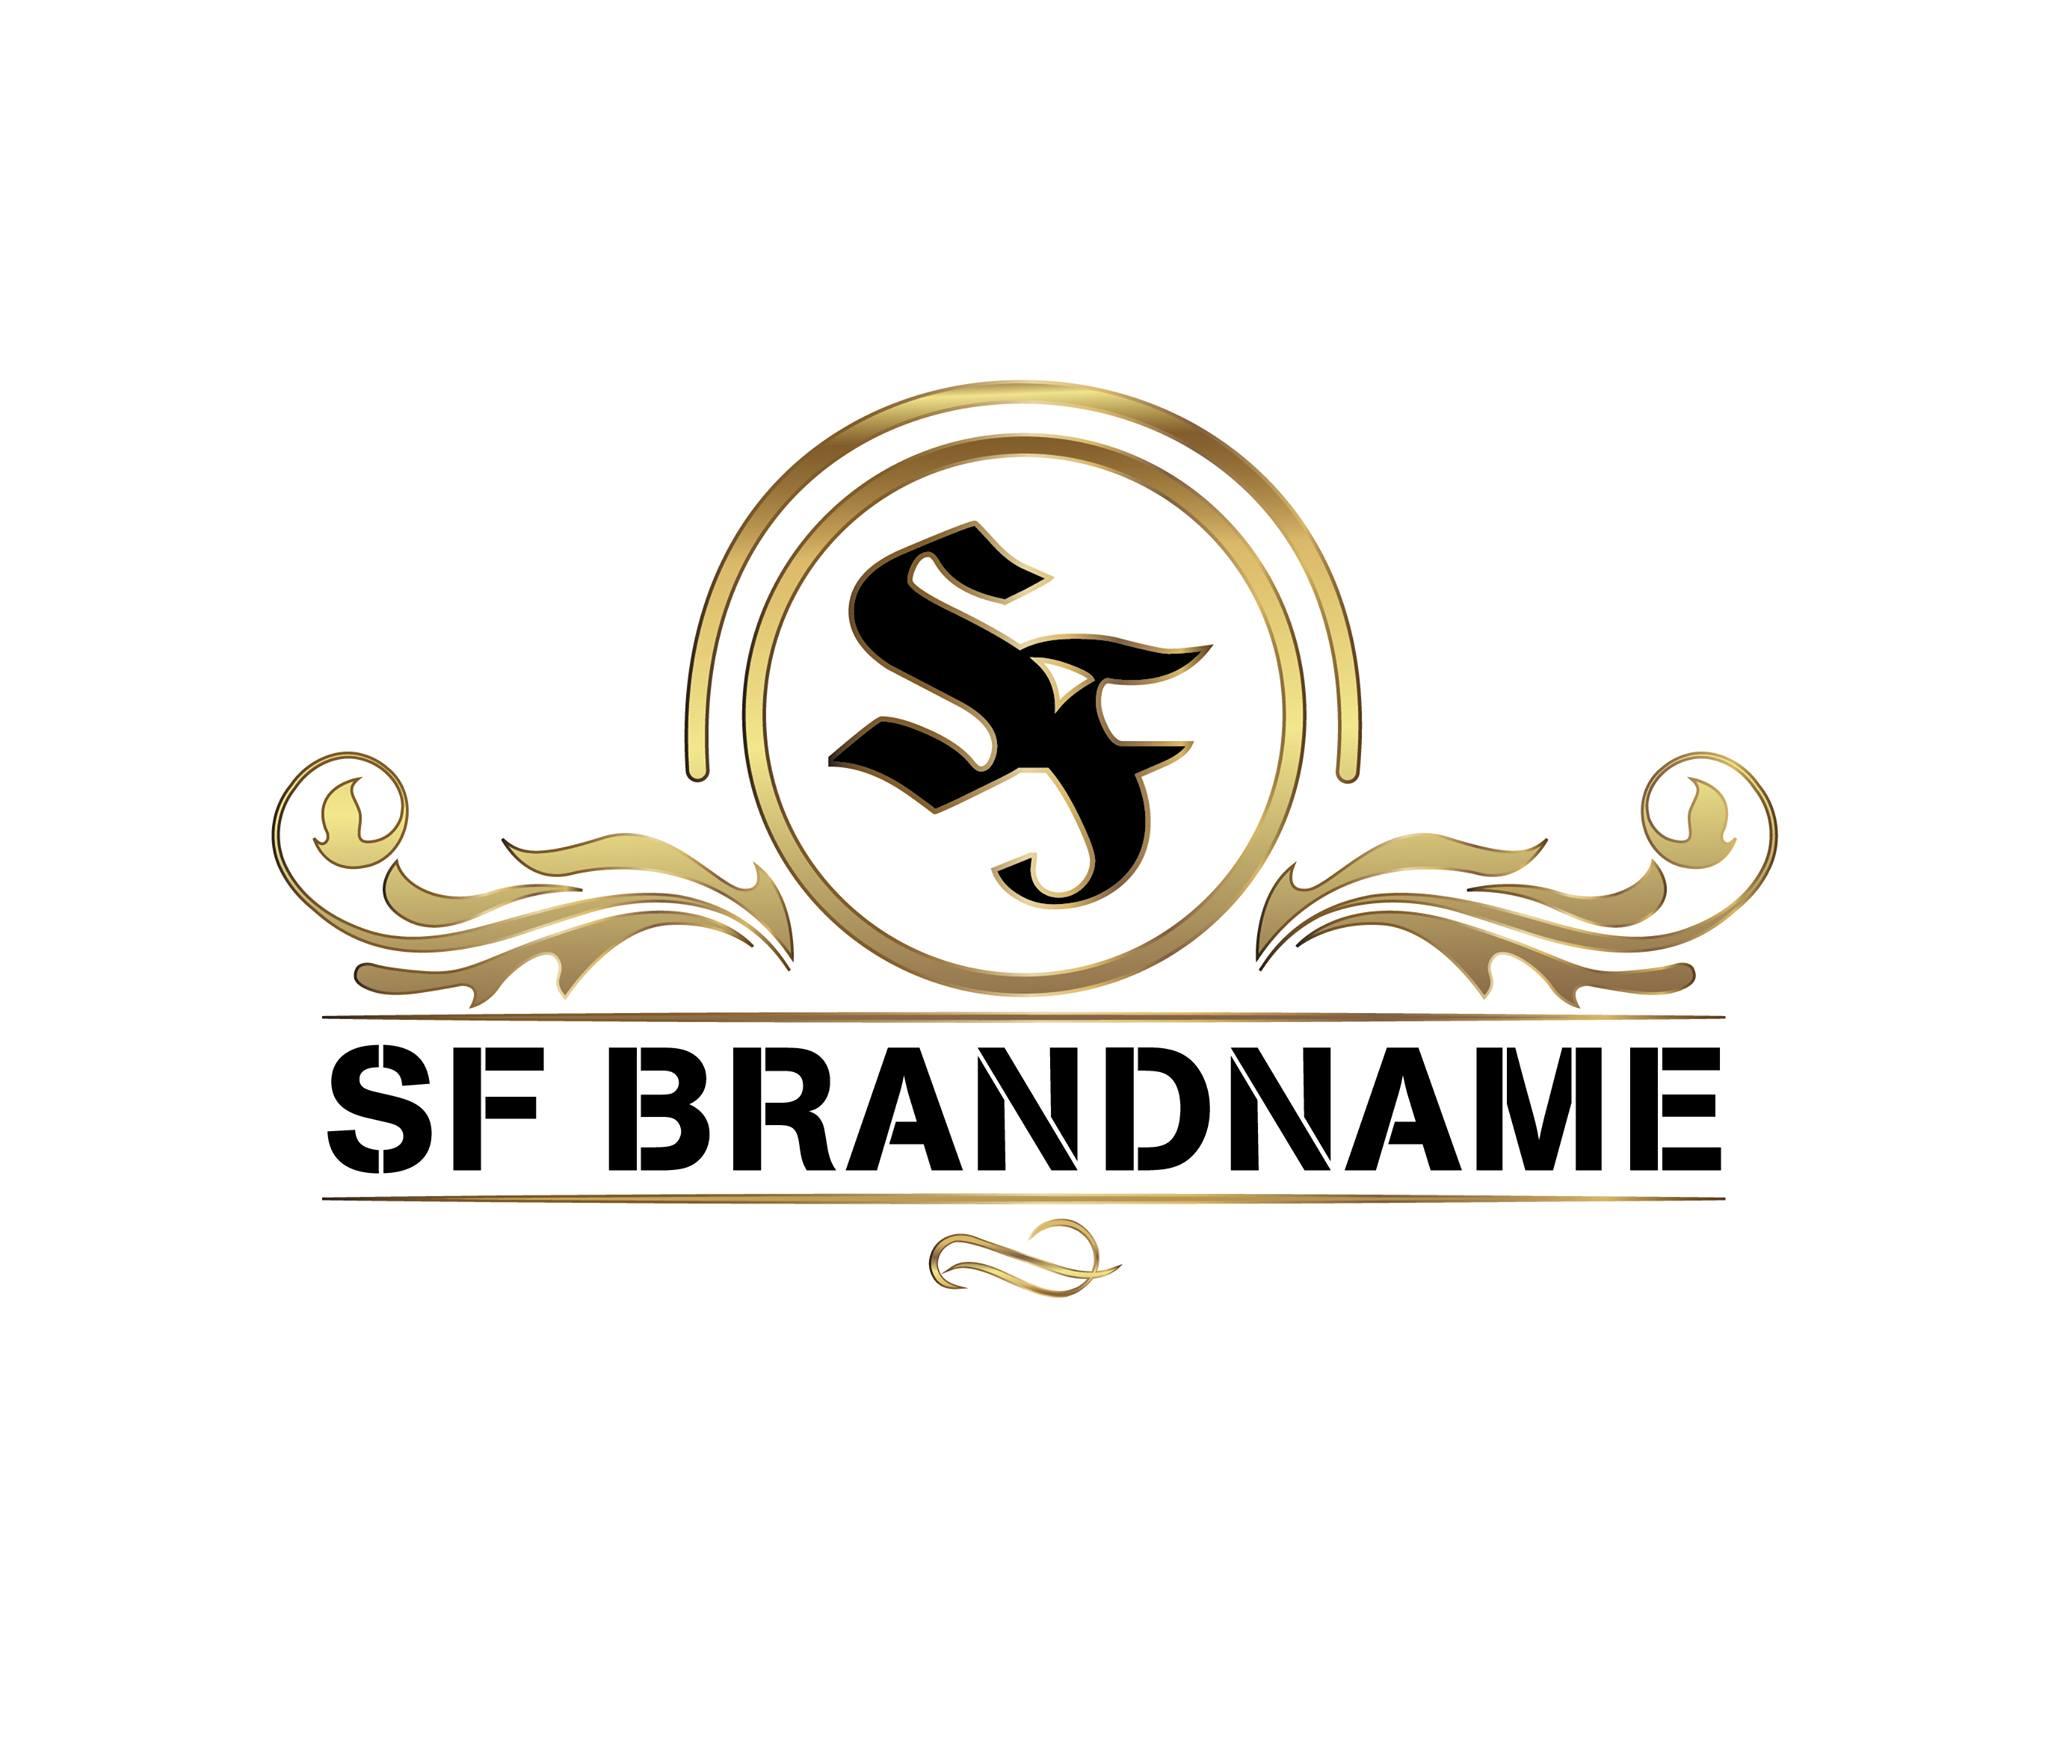 SFBrandname